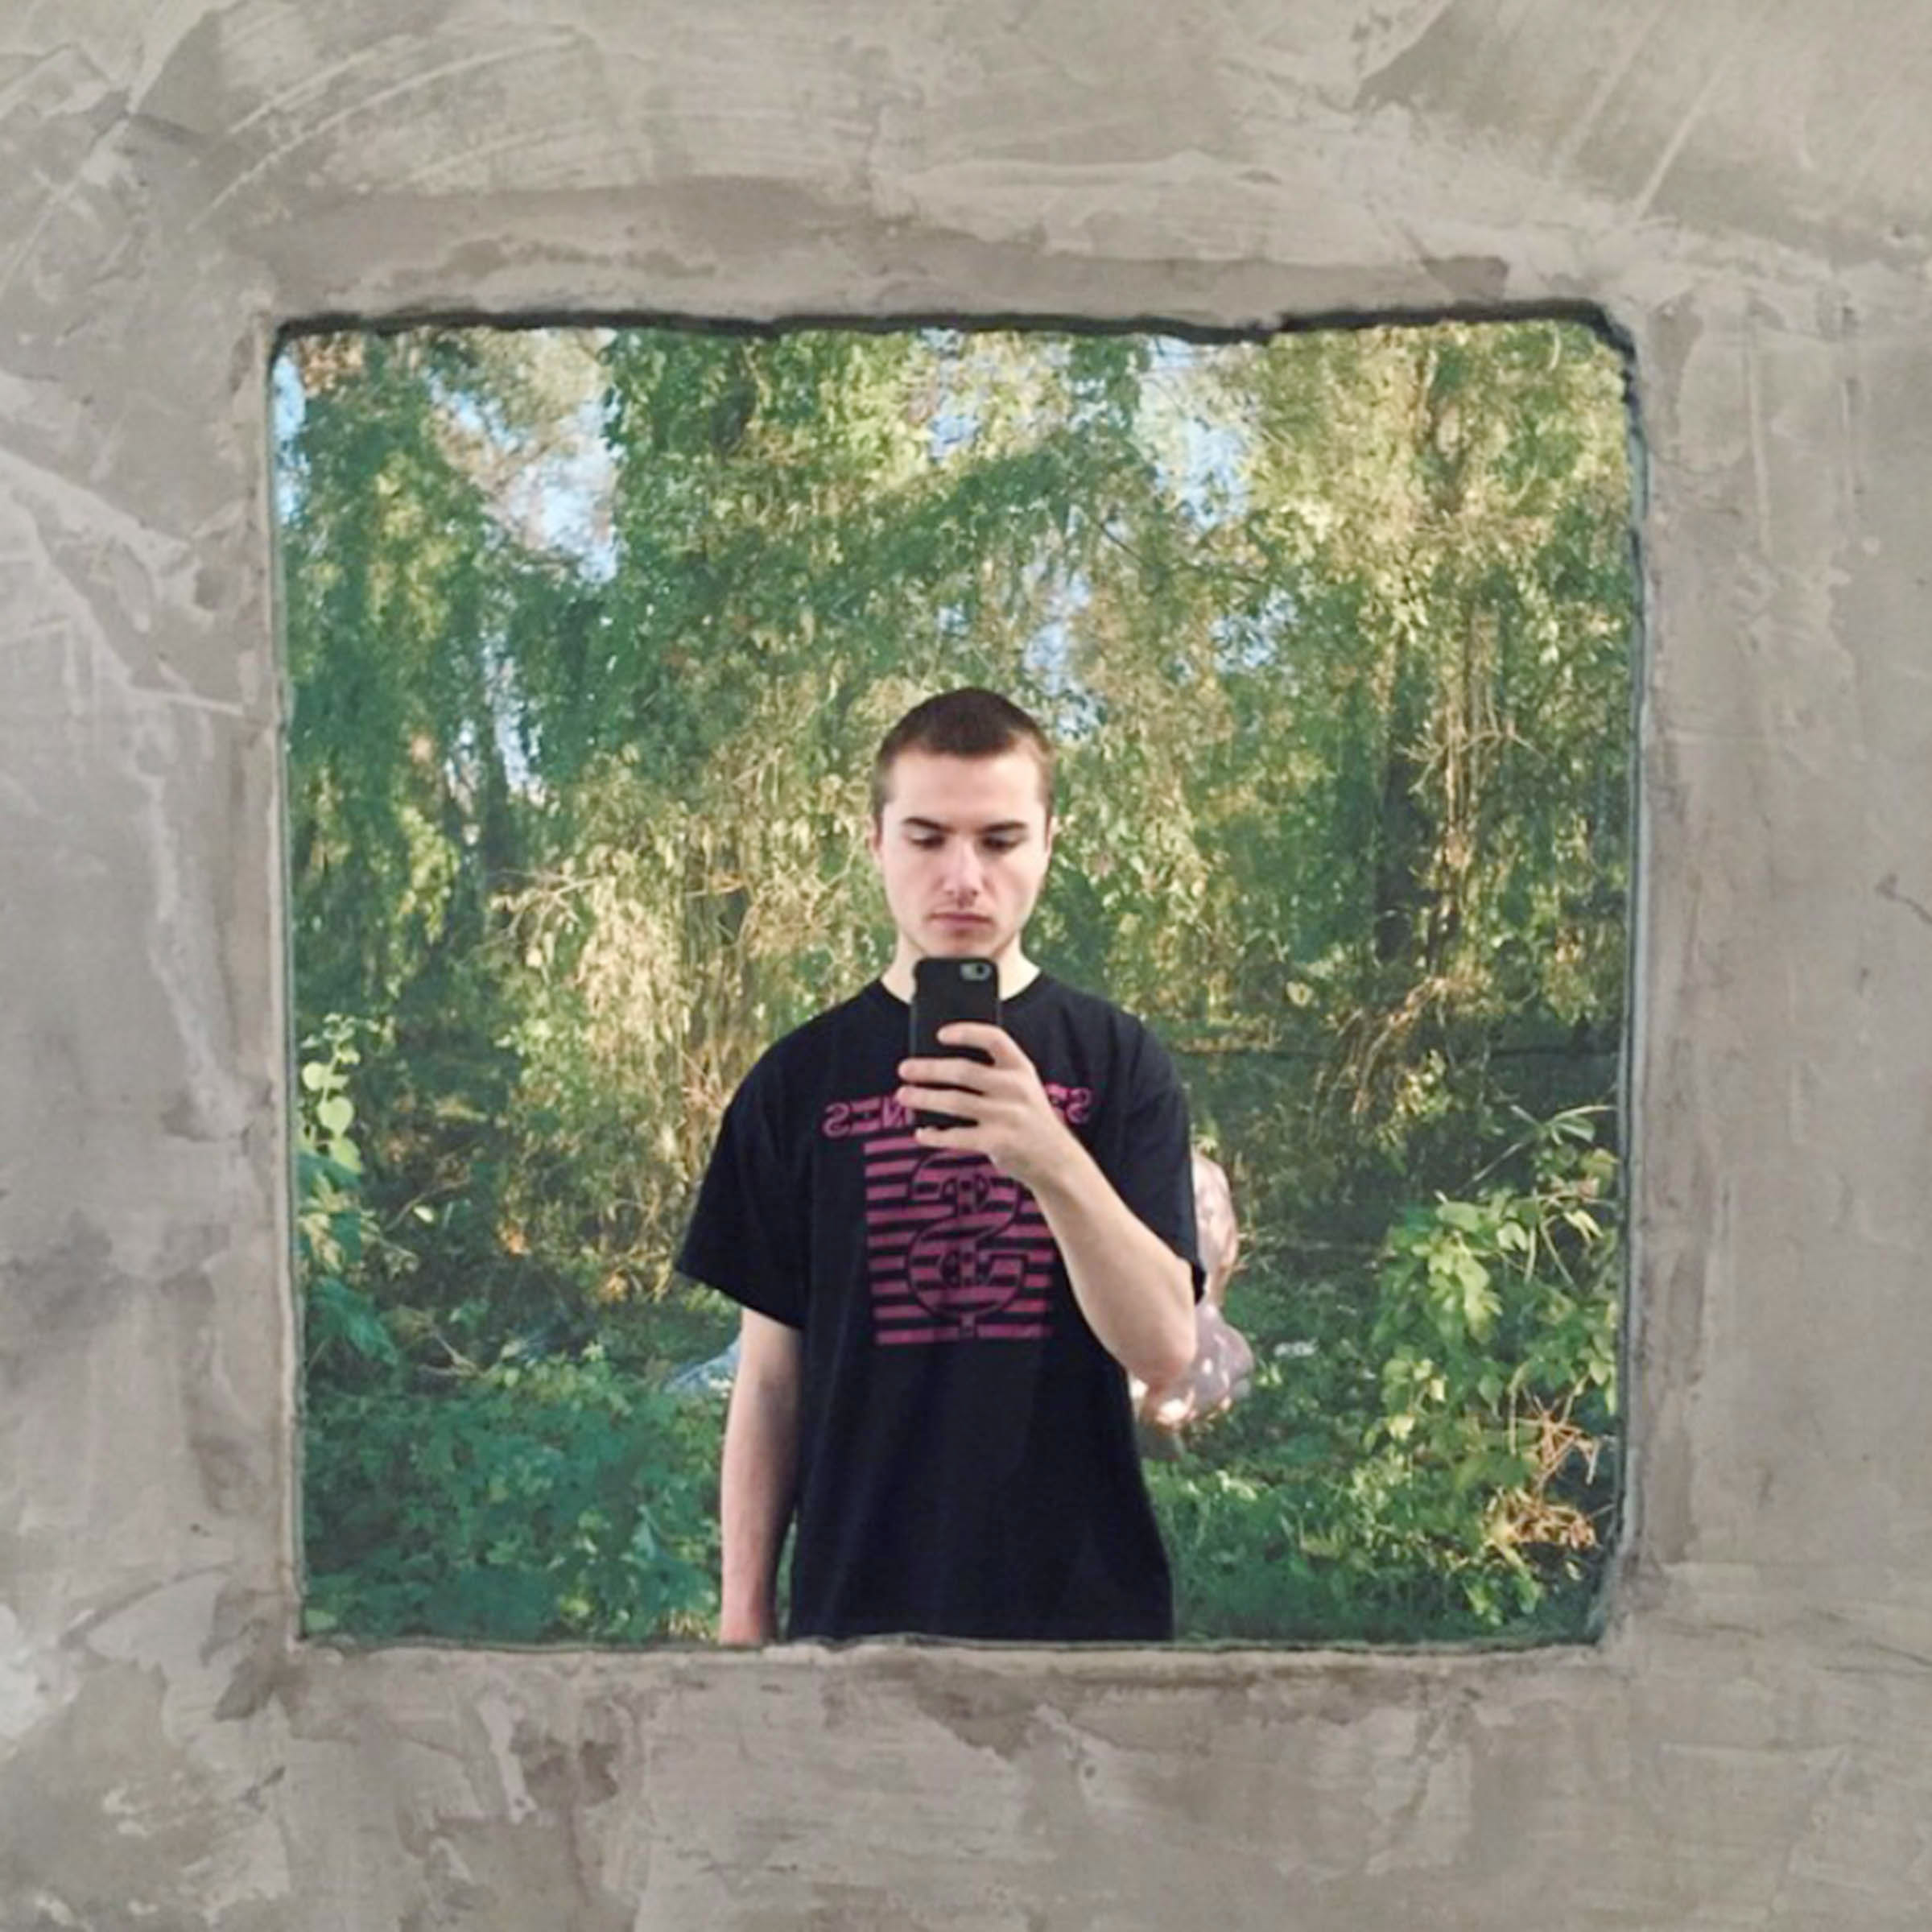 5_Self Portrait with David_Matthew Morrocco.jpg